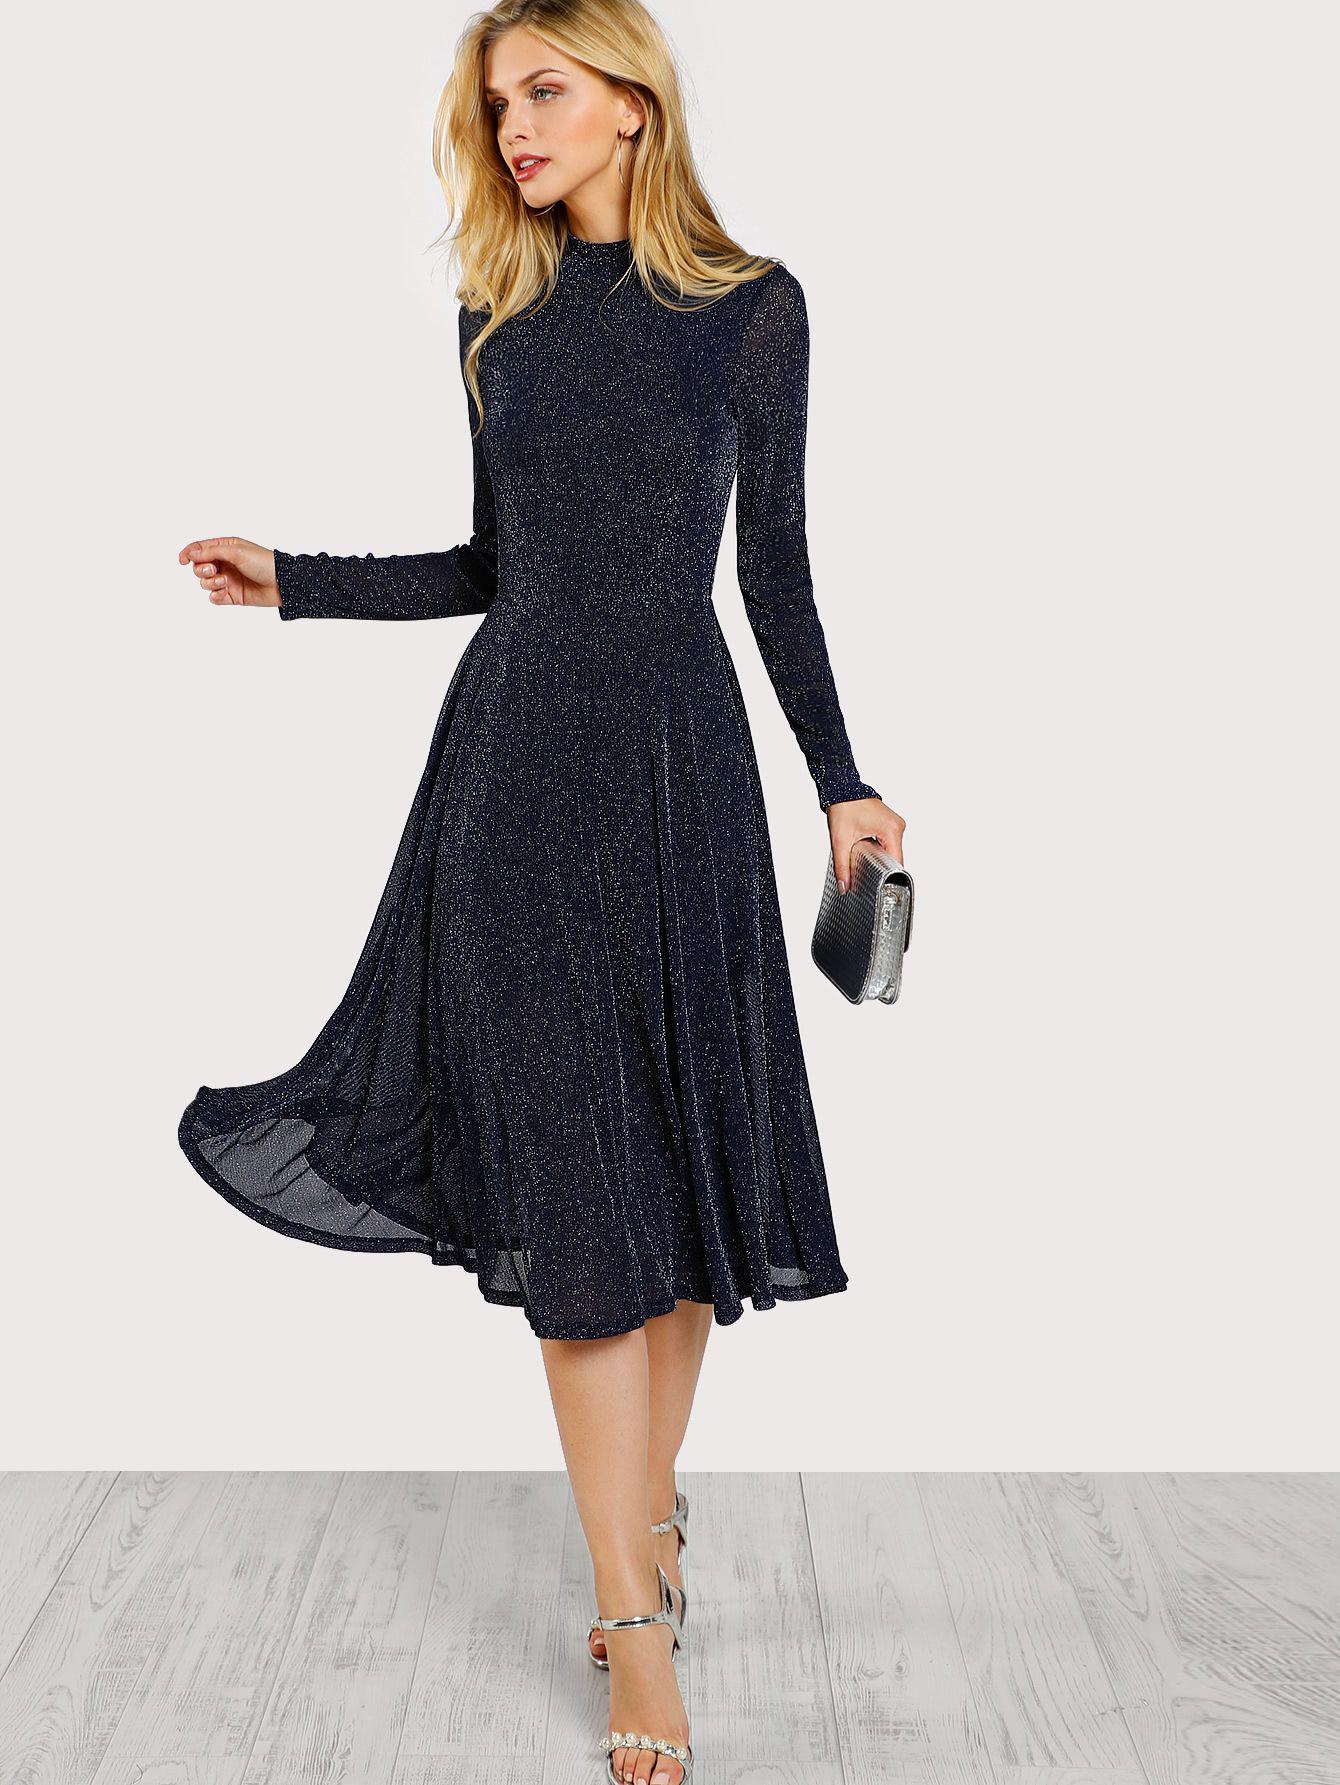 Mock neck glitter fit u flare dress fit flare dress dress online